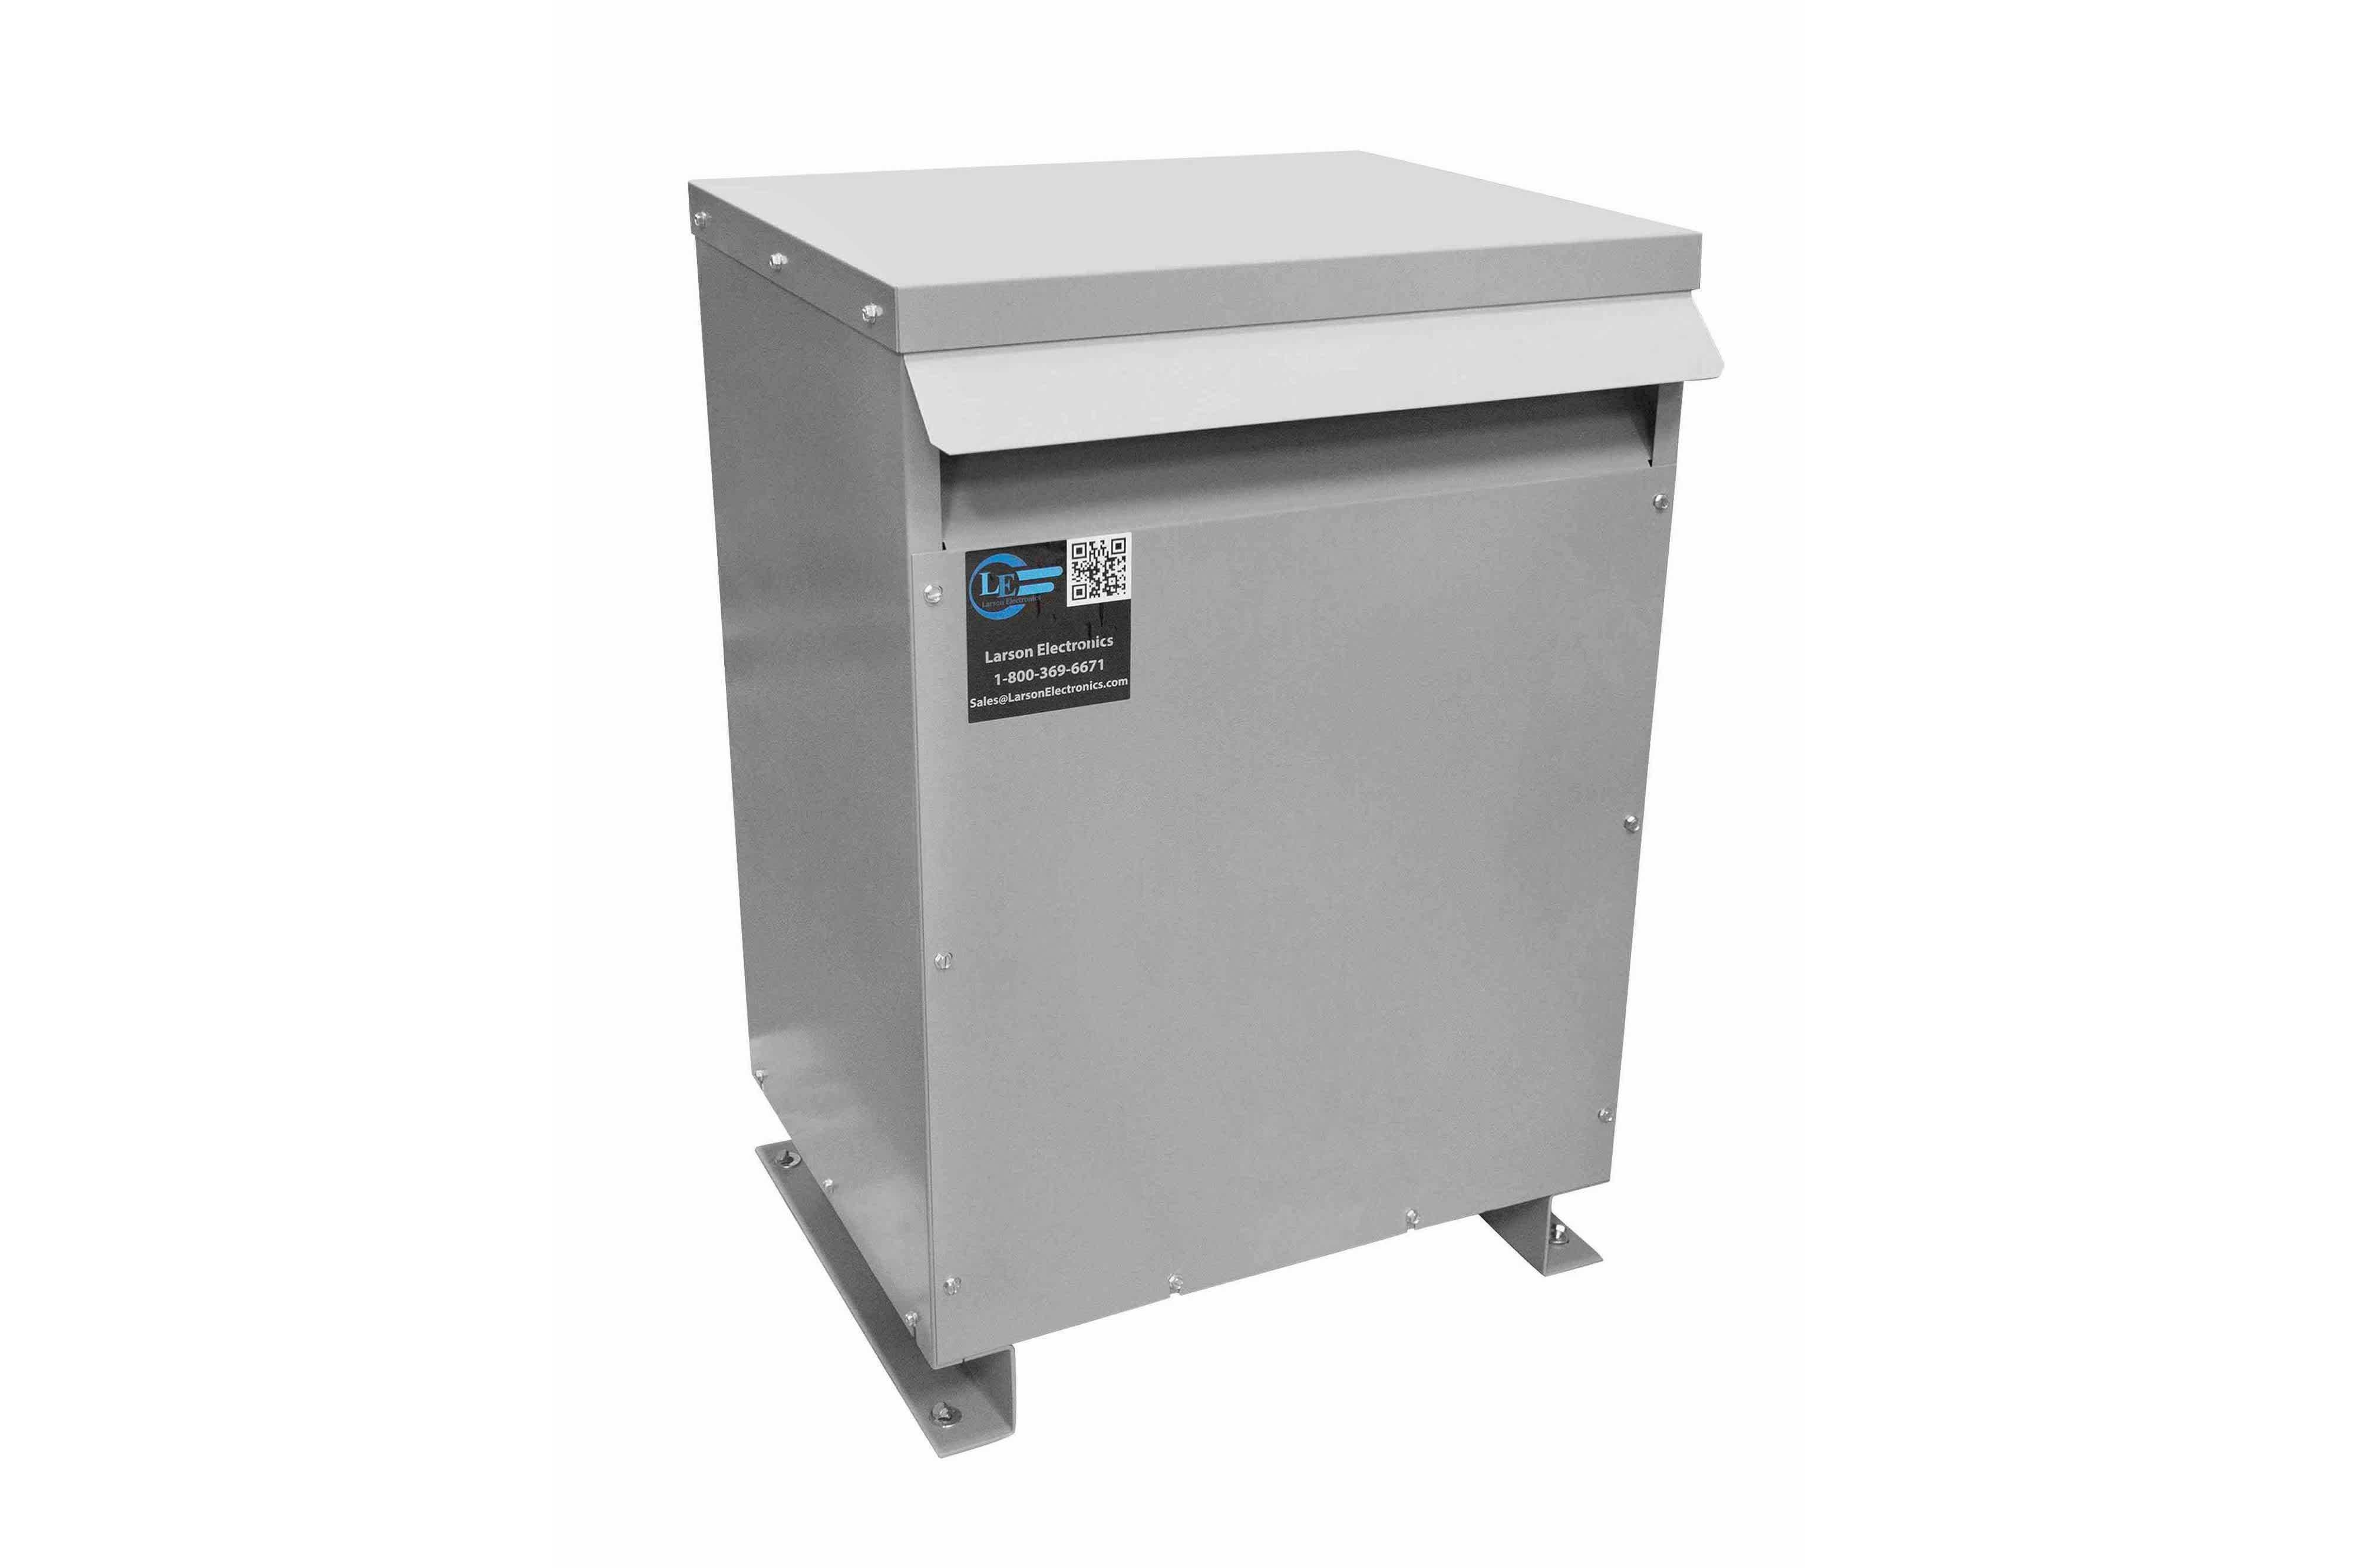 27 kVA 3PH Isolation Transformer, 240V Wye Primary, 400V Delta Secondary, N3R, Ventilated, 60 Hz